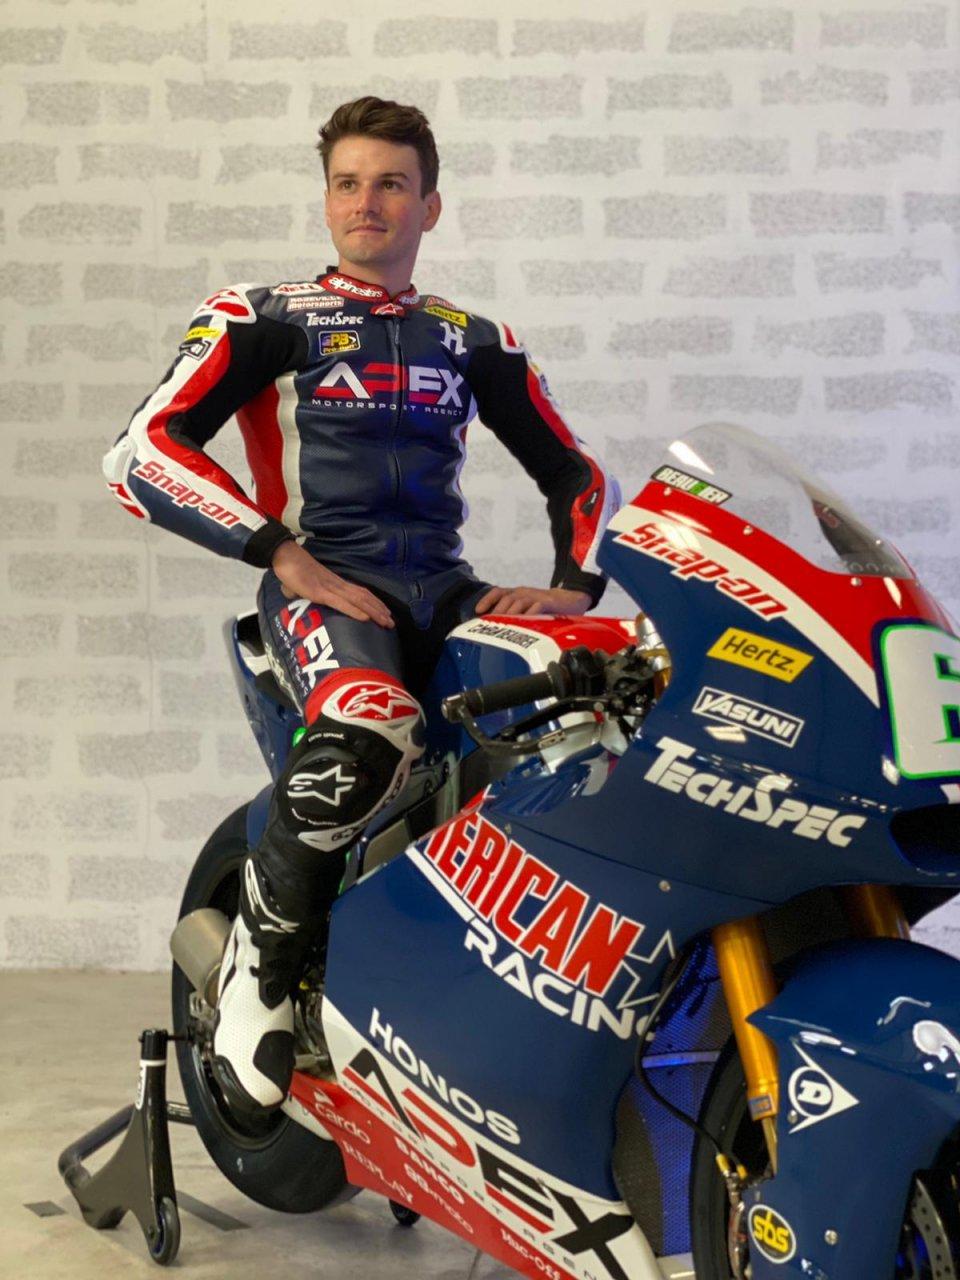 Moto2: Cameron Beaubier American Racing Team break cover at Portimao